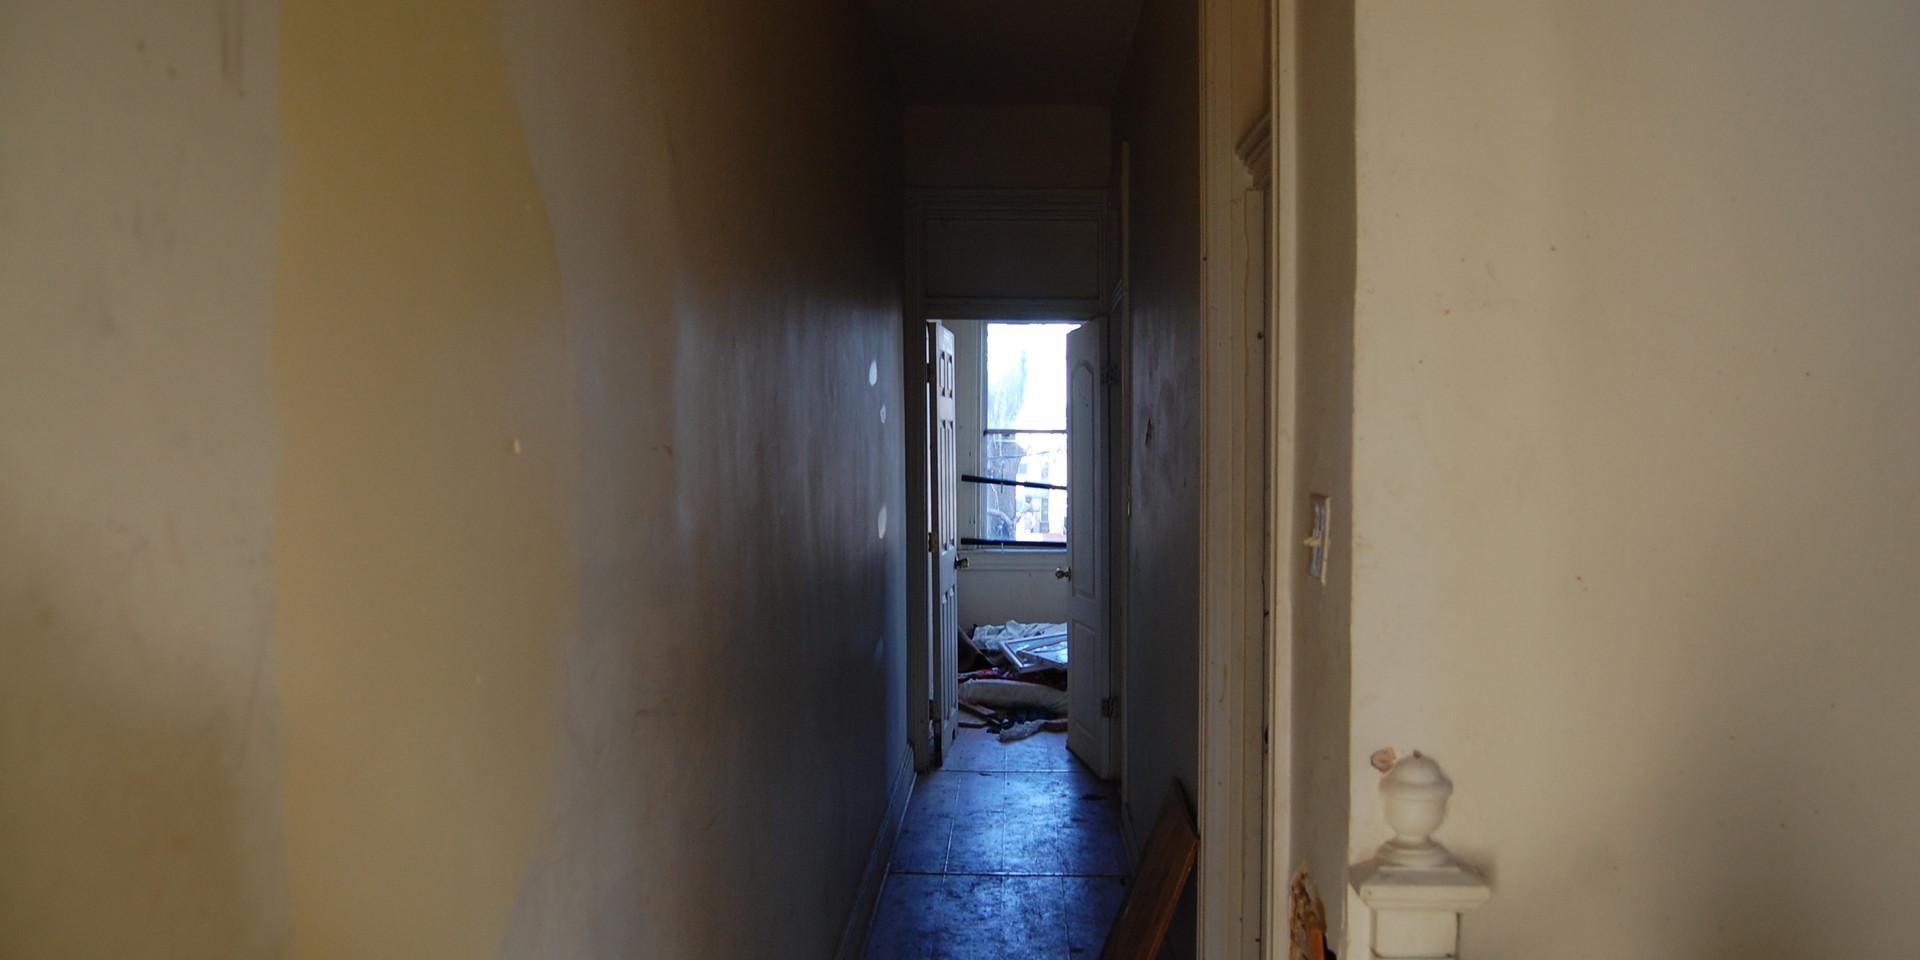 5.0 Hallway.JPG